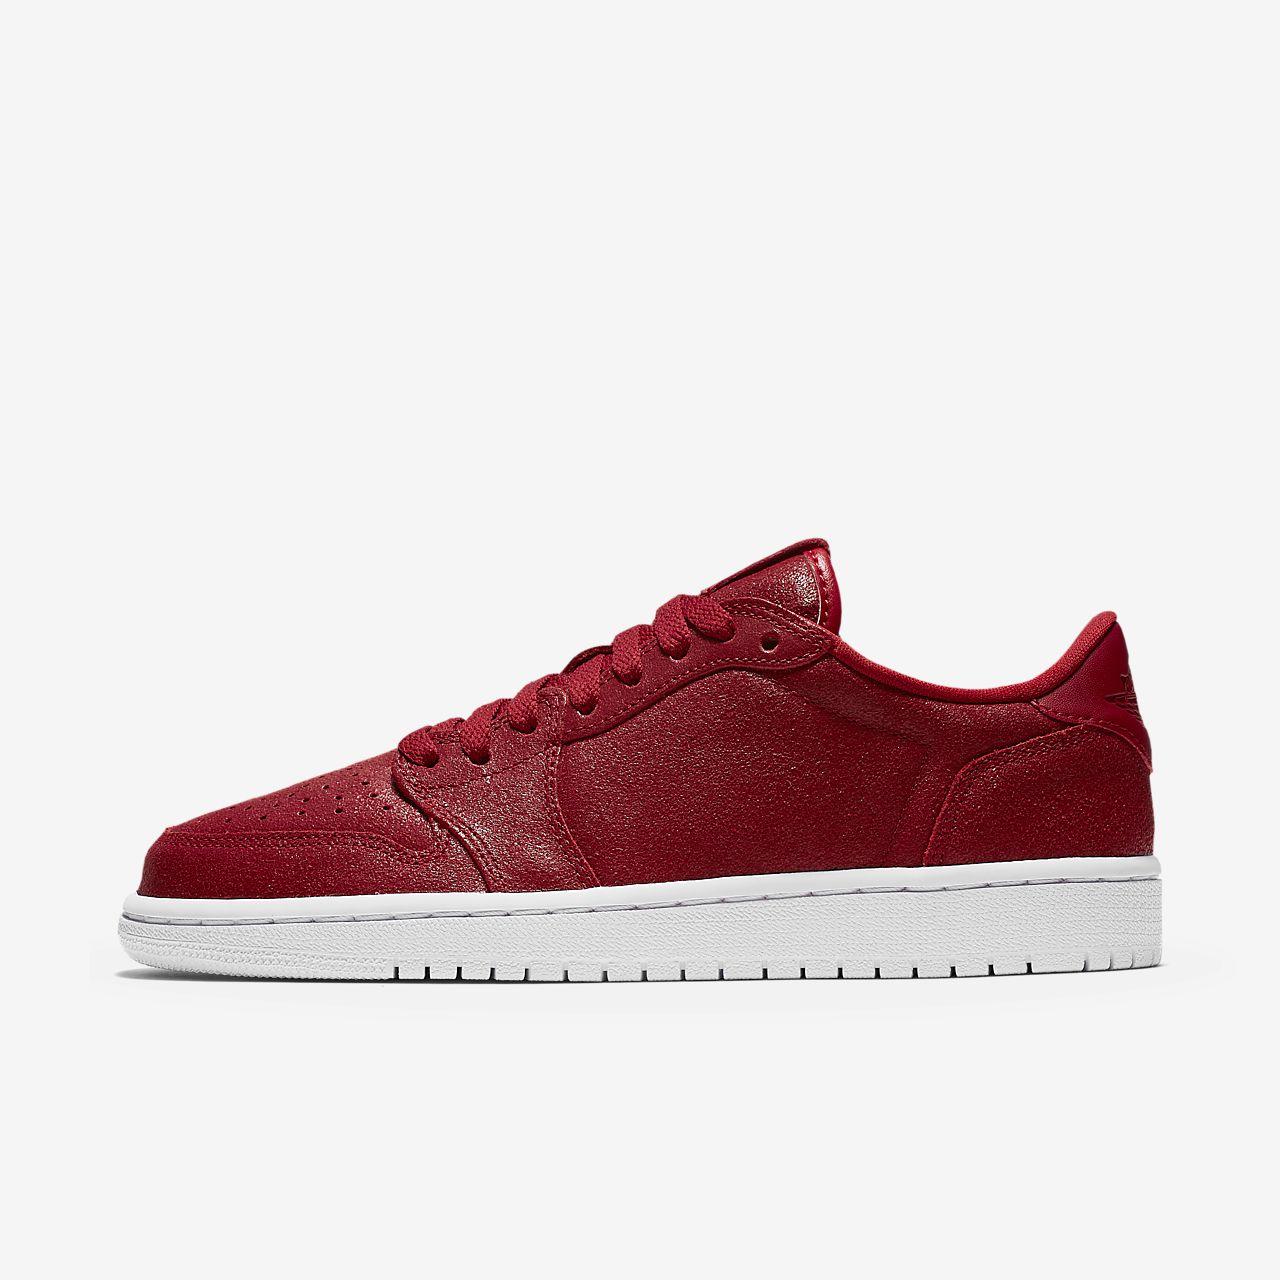 Buty damskie Air Jordan 1 Retro Low NS. Nike.com PL 5860065753d